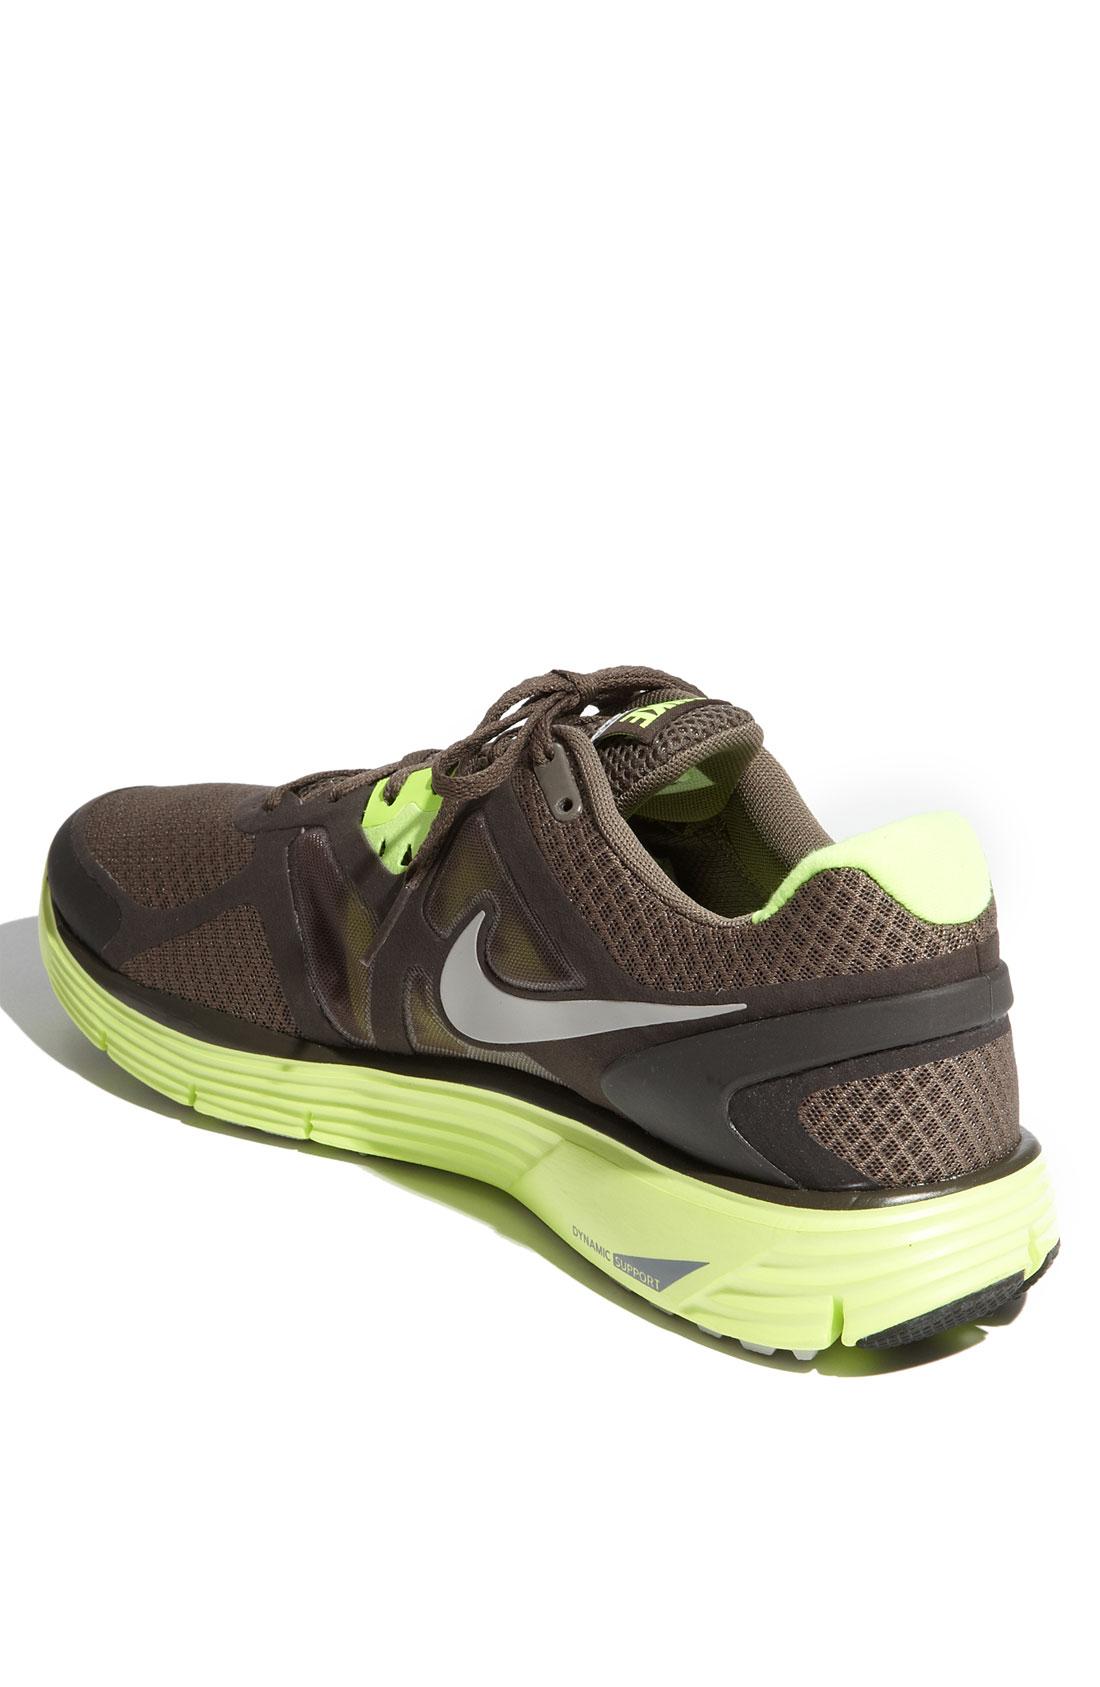 aa1a58162e9354 ... Nike Lunarglide+ 3 Running Shoe in Brown for Men Lyst ...